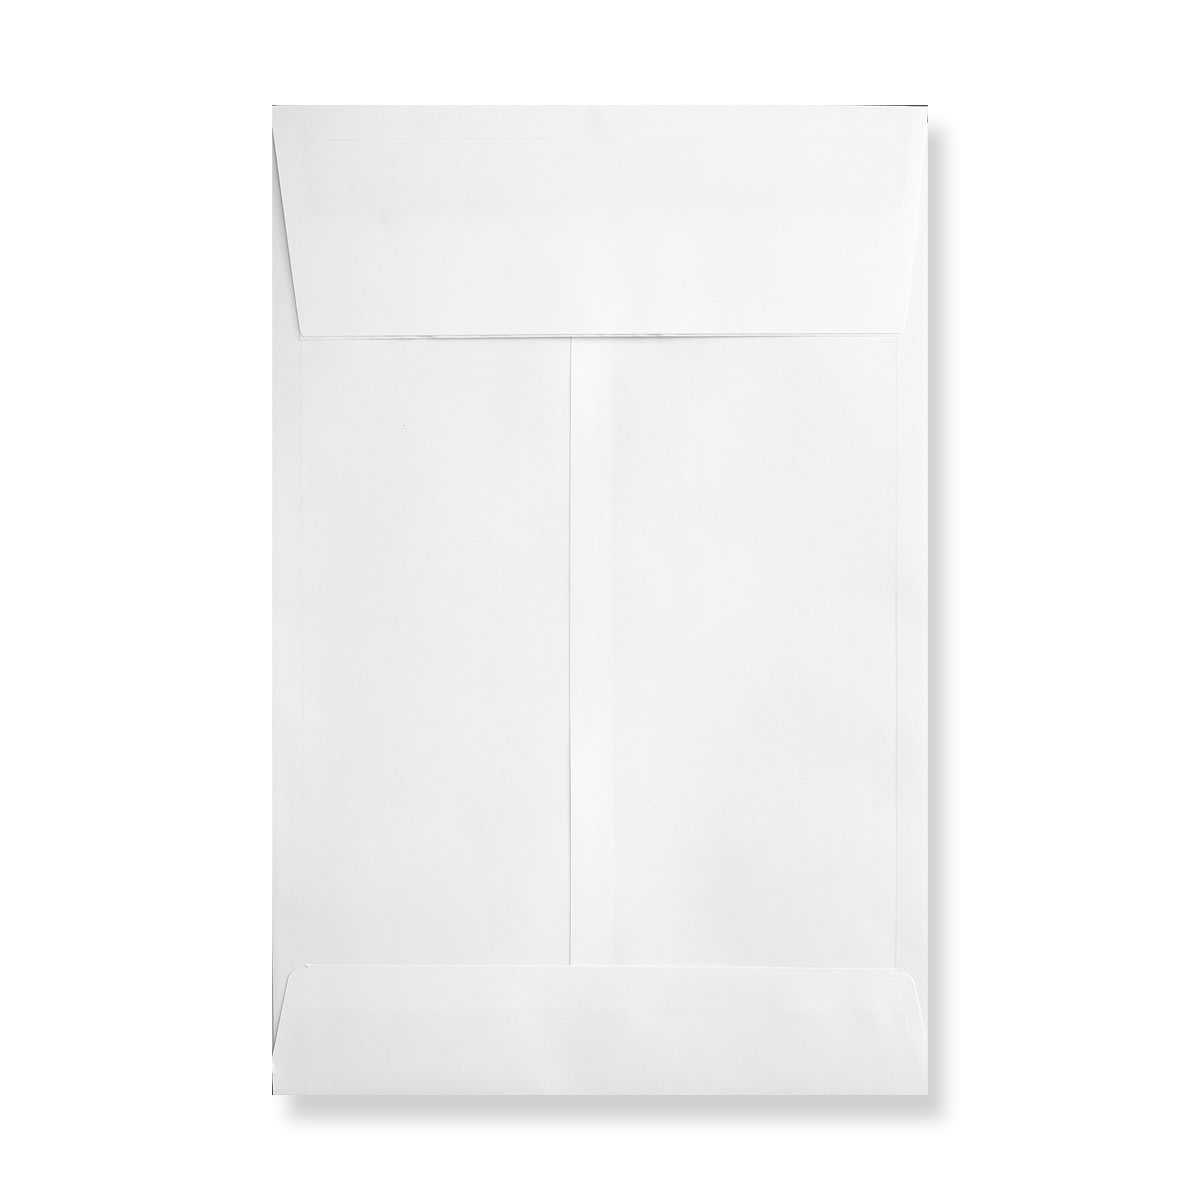 C4 WHITE GUSSET WINDOW ENVELOPES